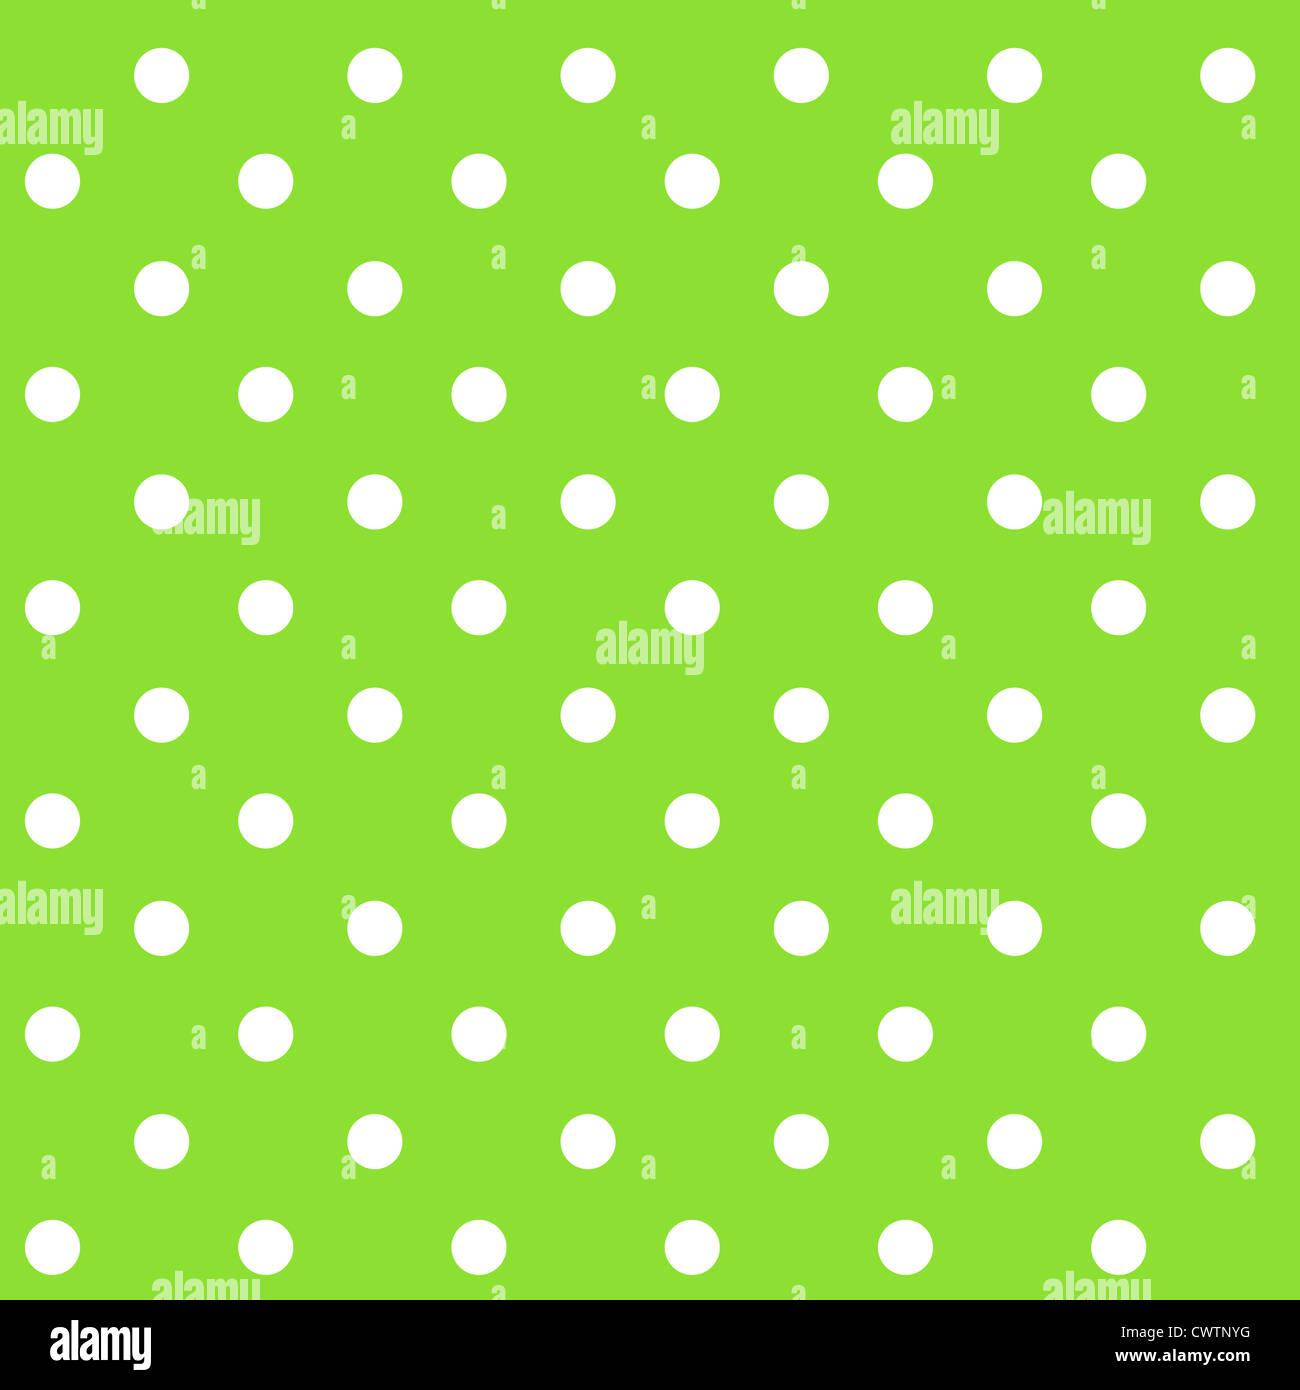 Seamless polka dots pattern Stock Photo